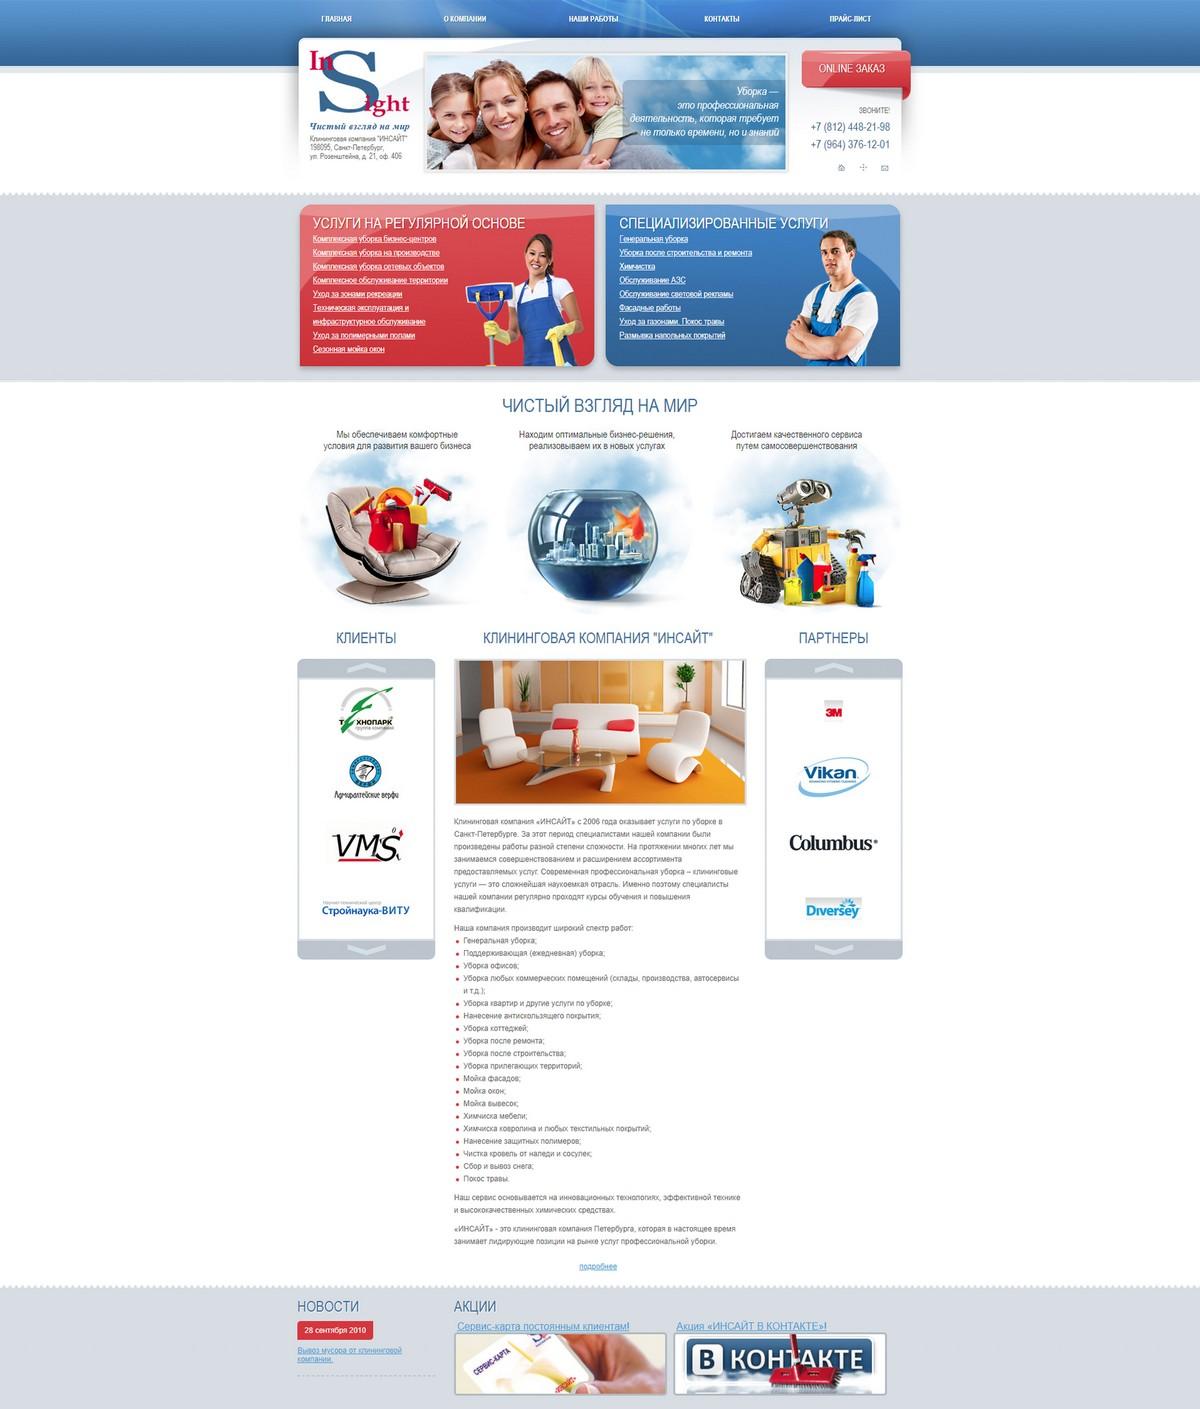 полноразмерный скриншот сайта http://spb-insight.ru/